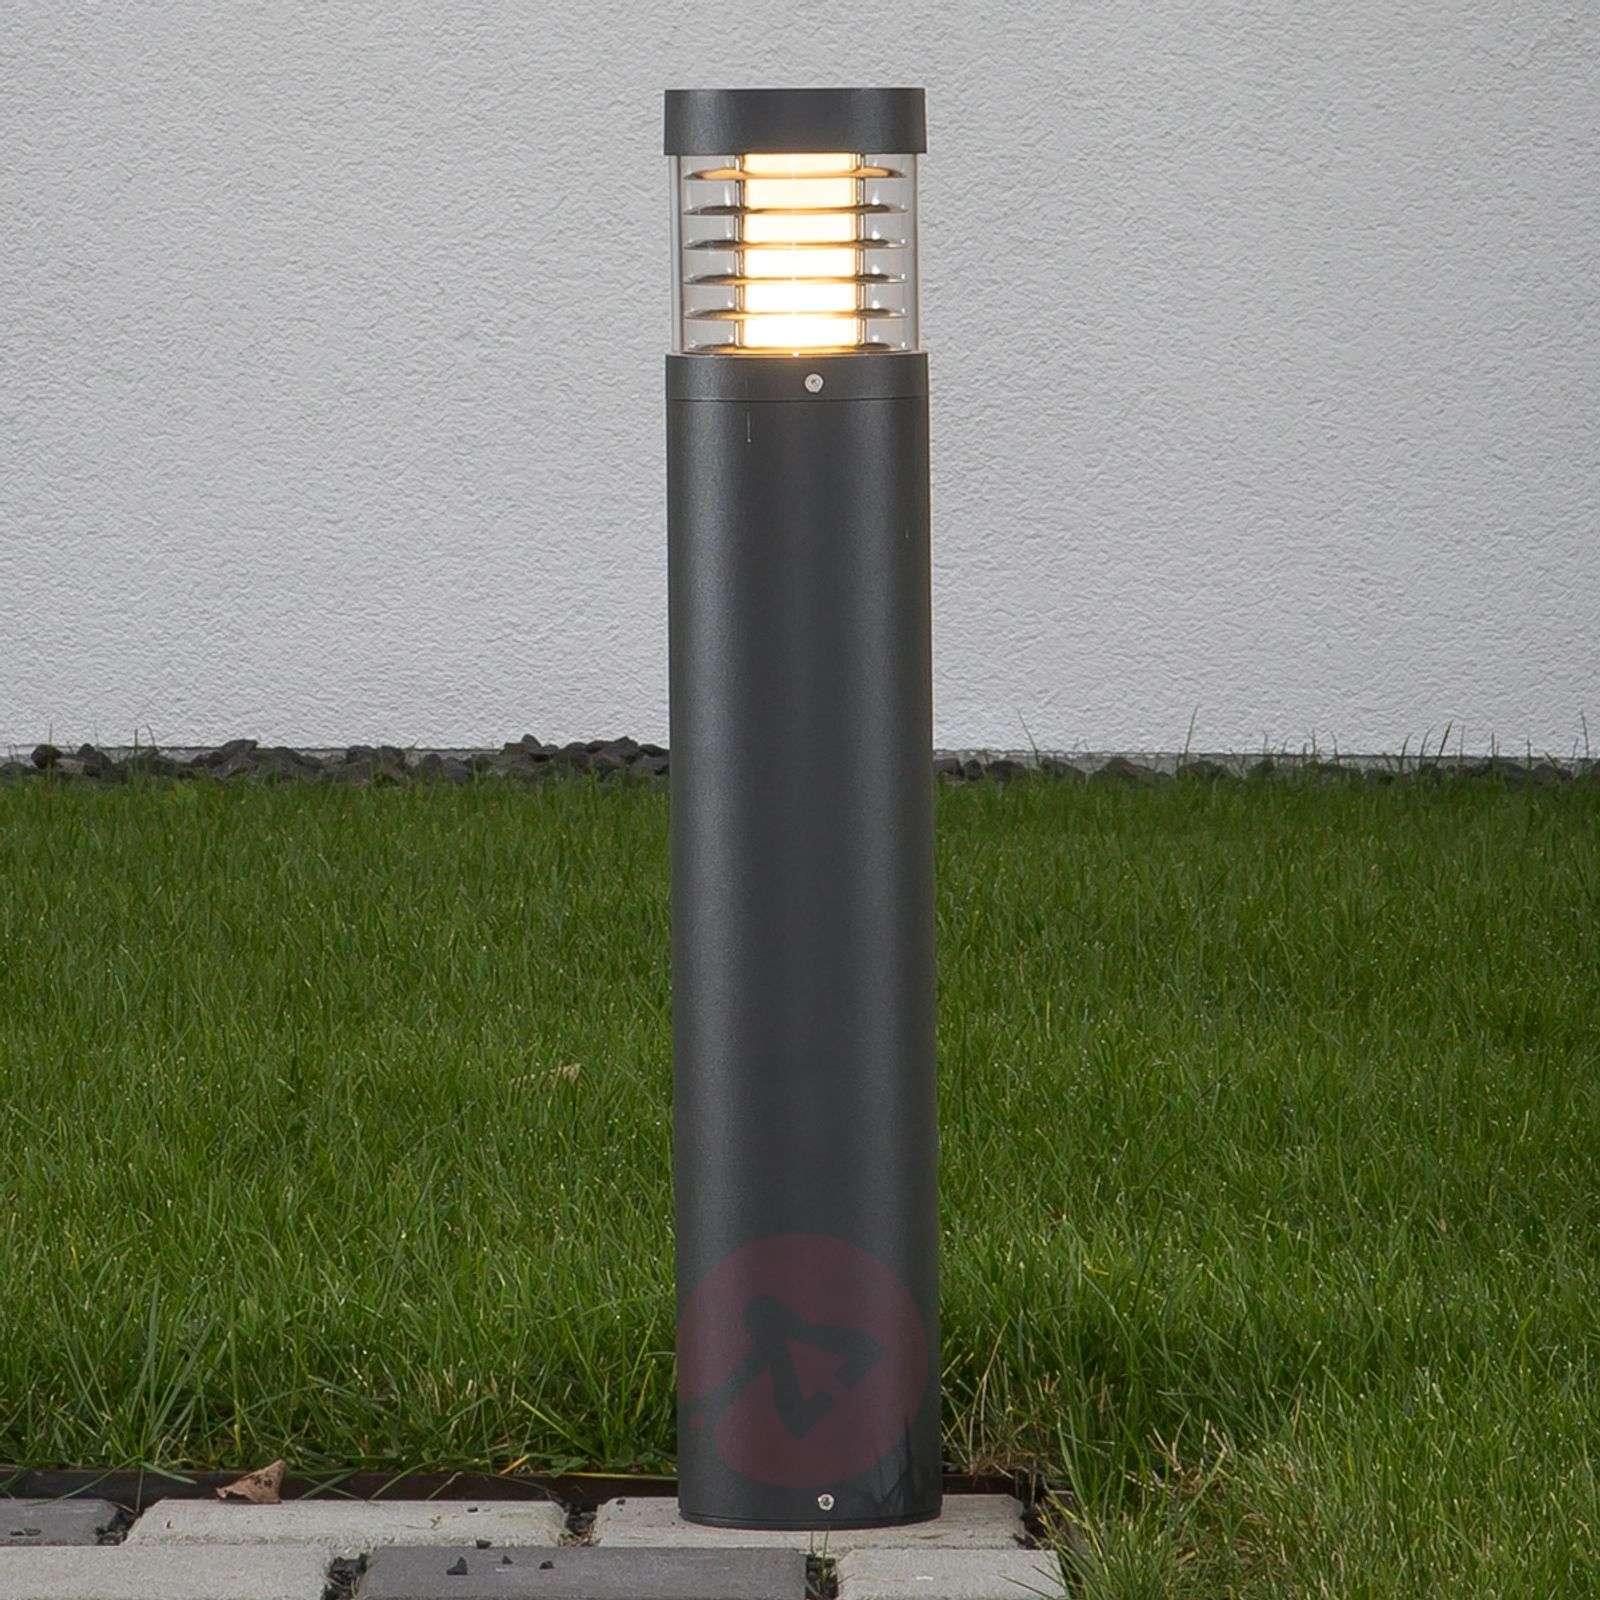 Grafiitinharmaa LED-valaisin Lucius 65cm korkea-9616053-01